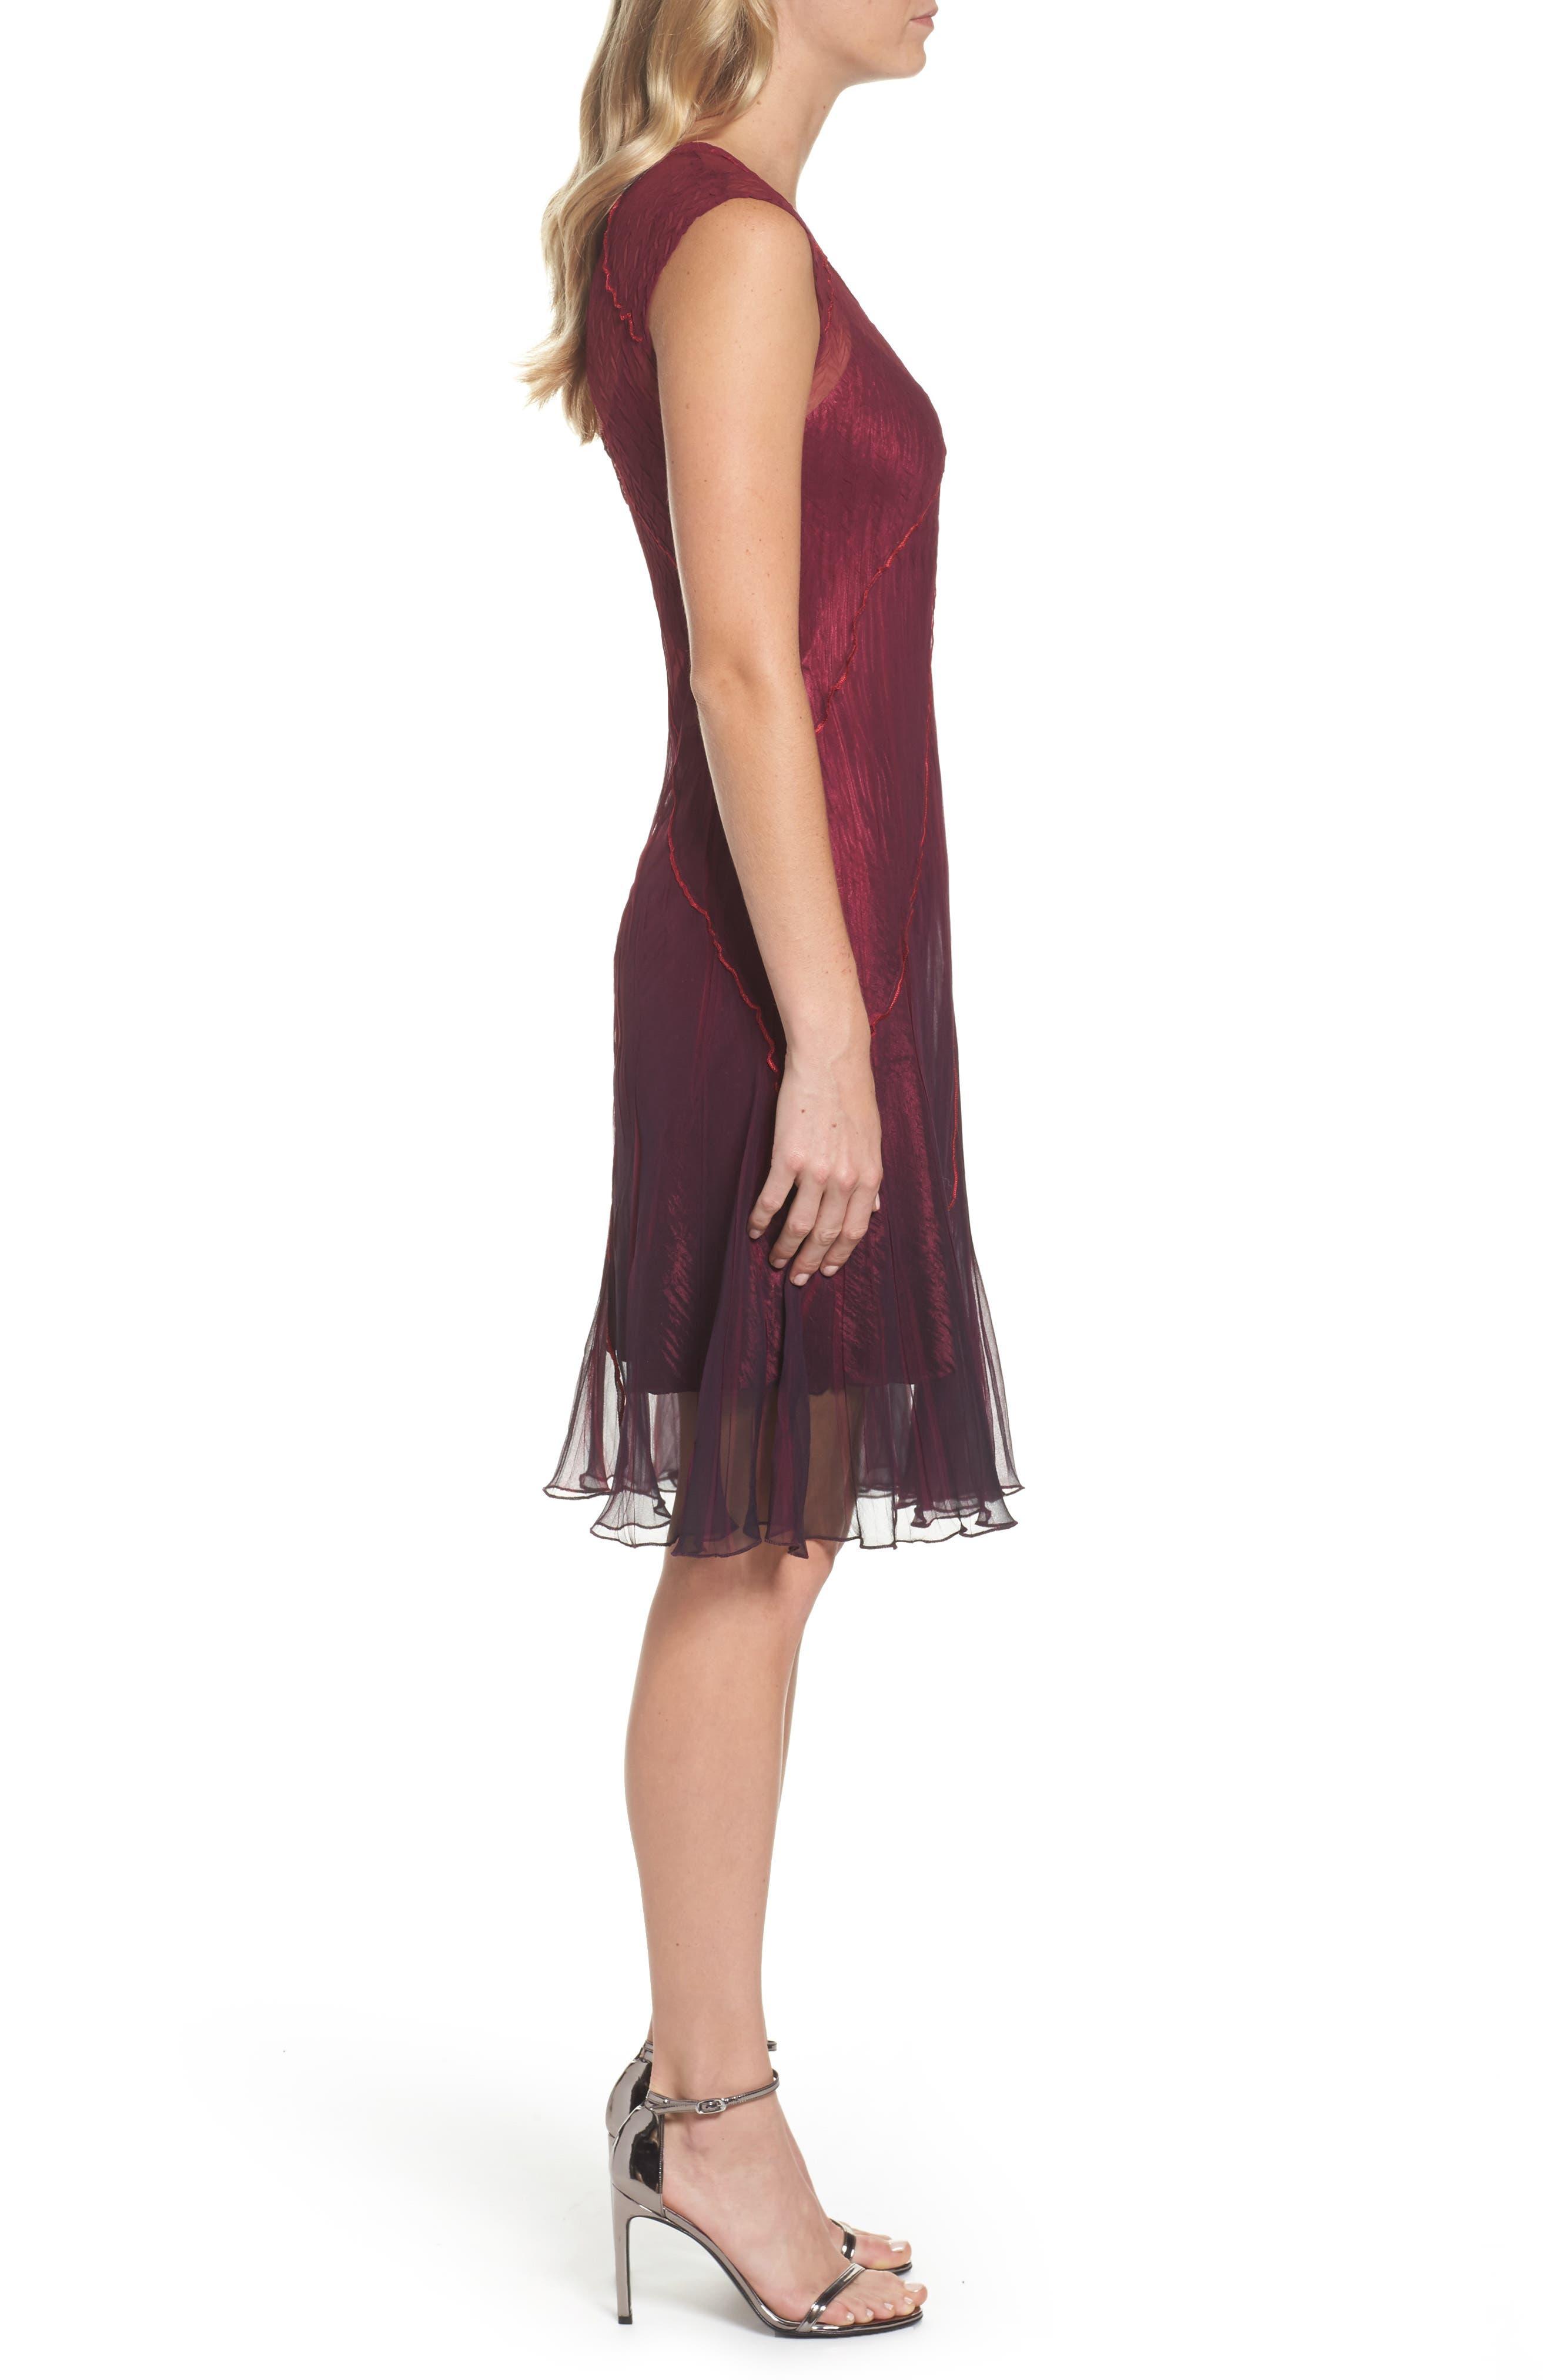 Chiffon A-Line Dress,                             Alternate thumbnail 3, color,                             Red Plum Blue Ombre